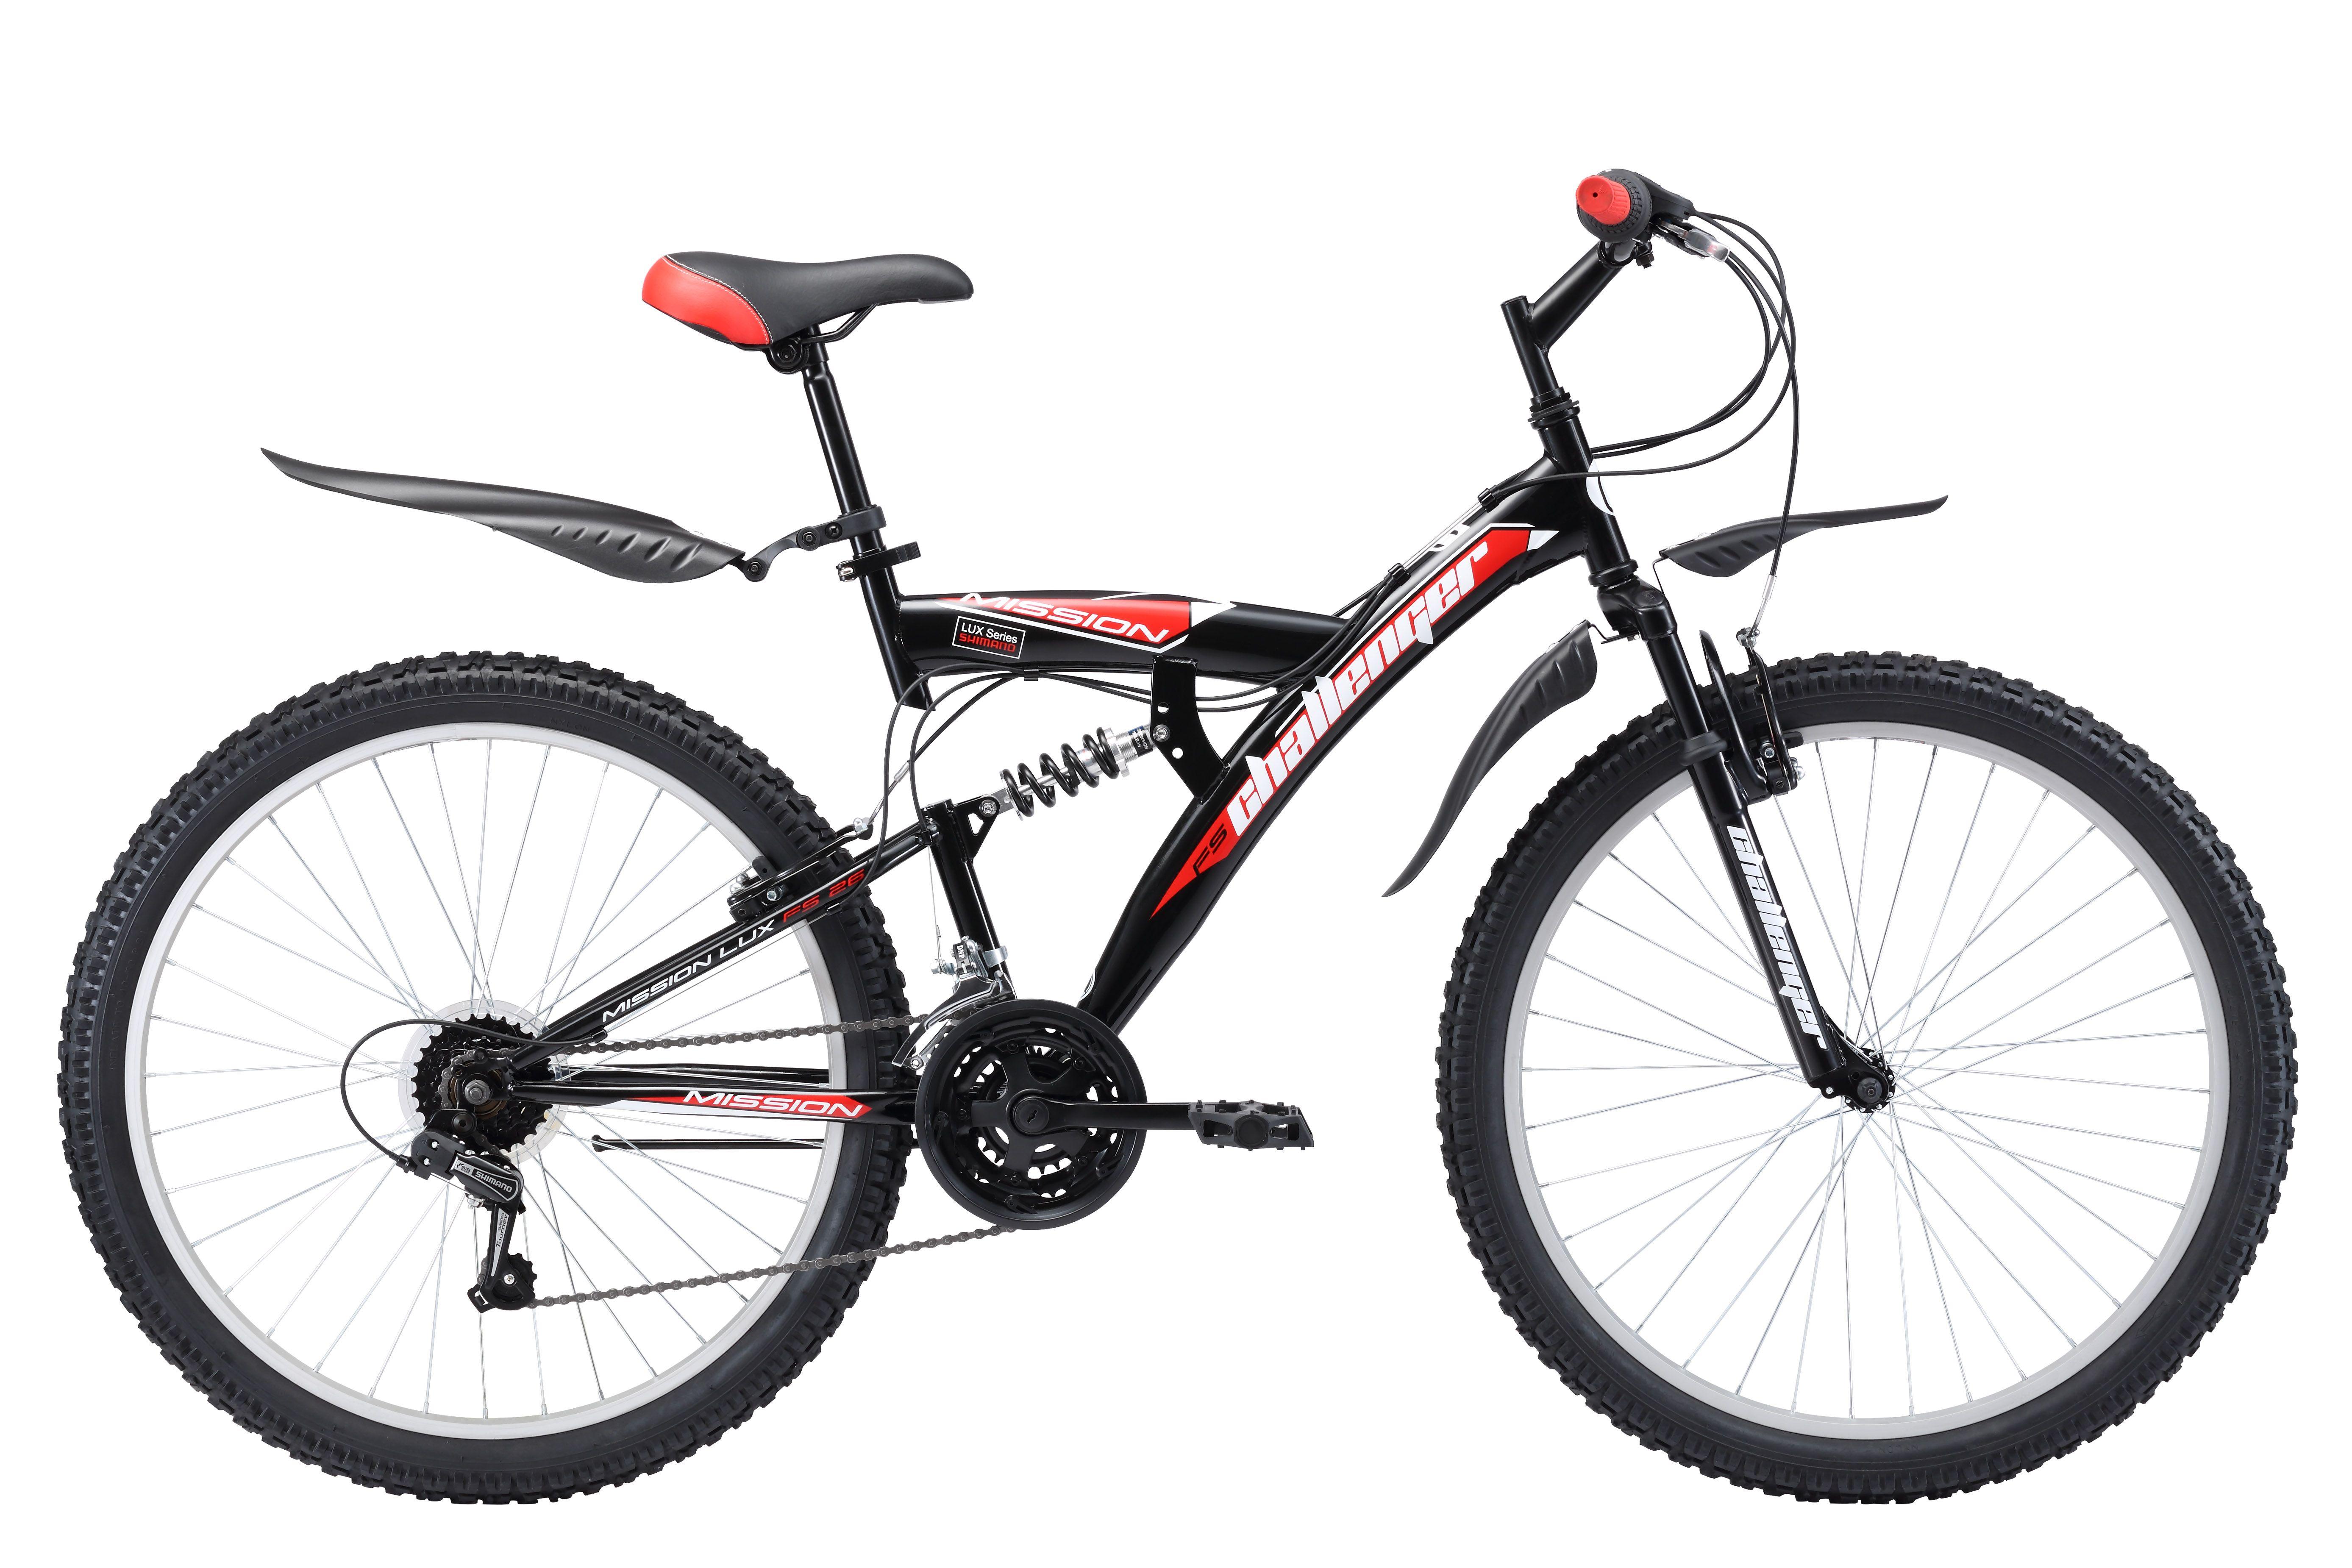 CHALLENGER Велосипед Challenger Mission Lux FS 26 (2017) черно-синий 20 цена 2016